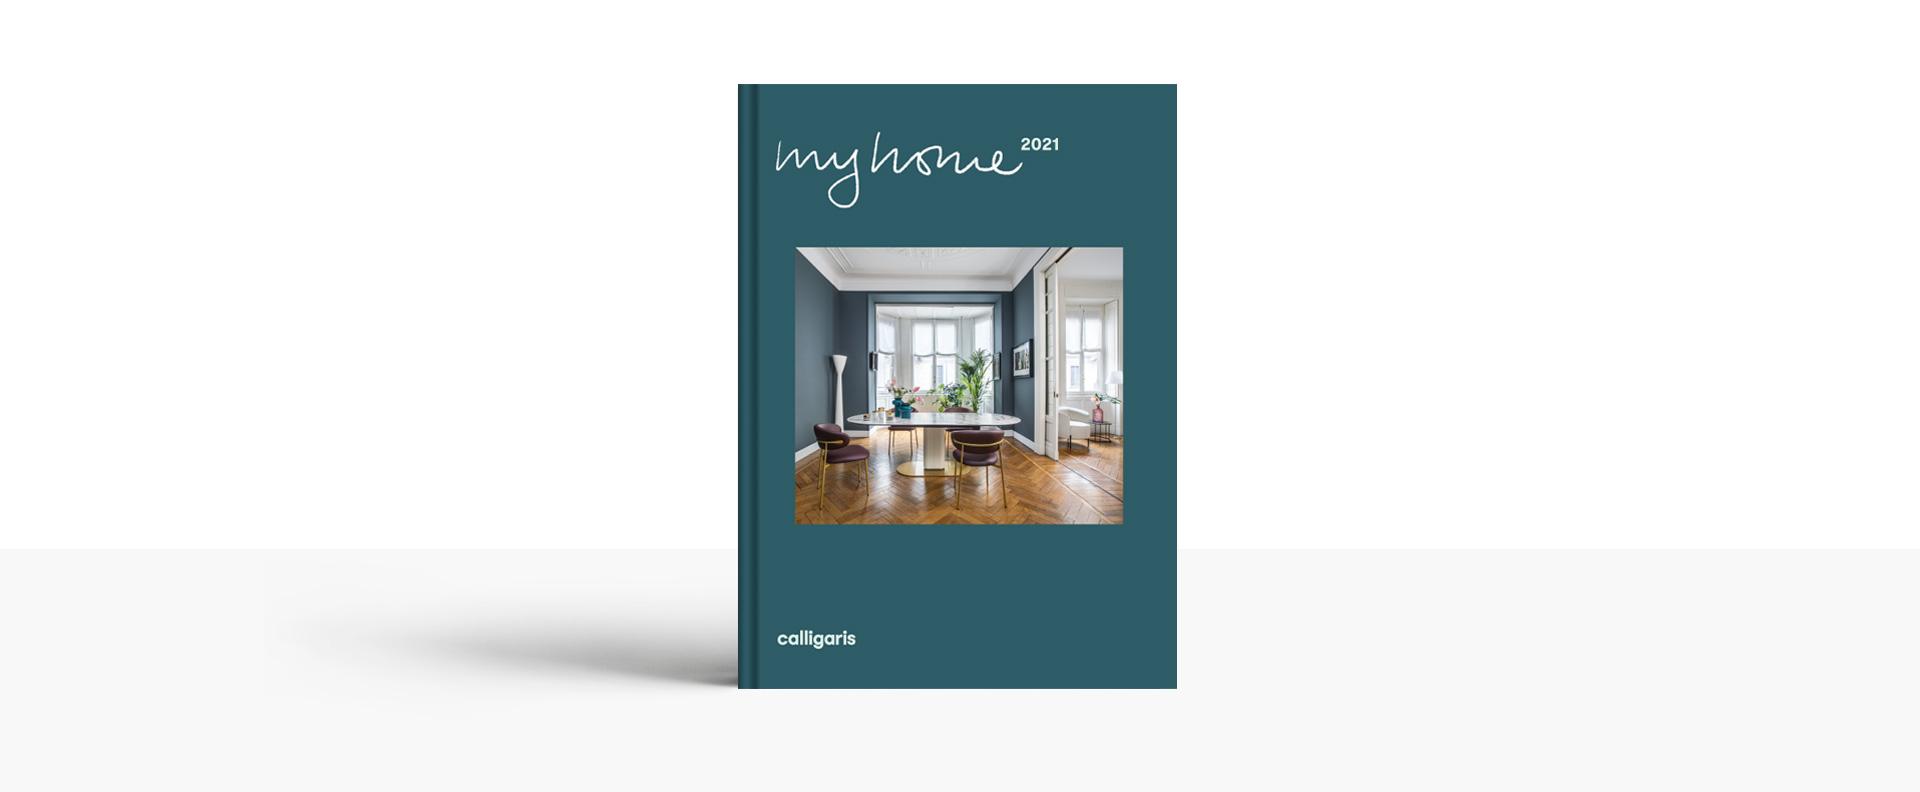 catalogo-calligaris-2021-typ